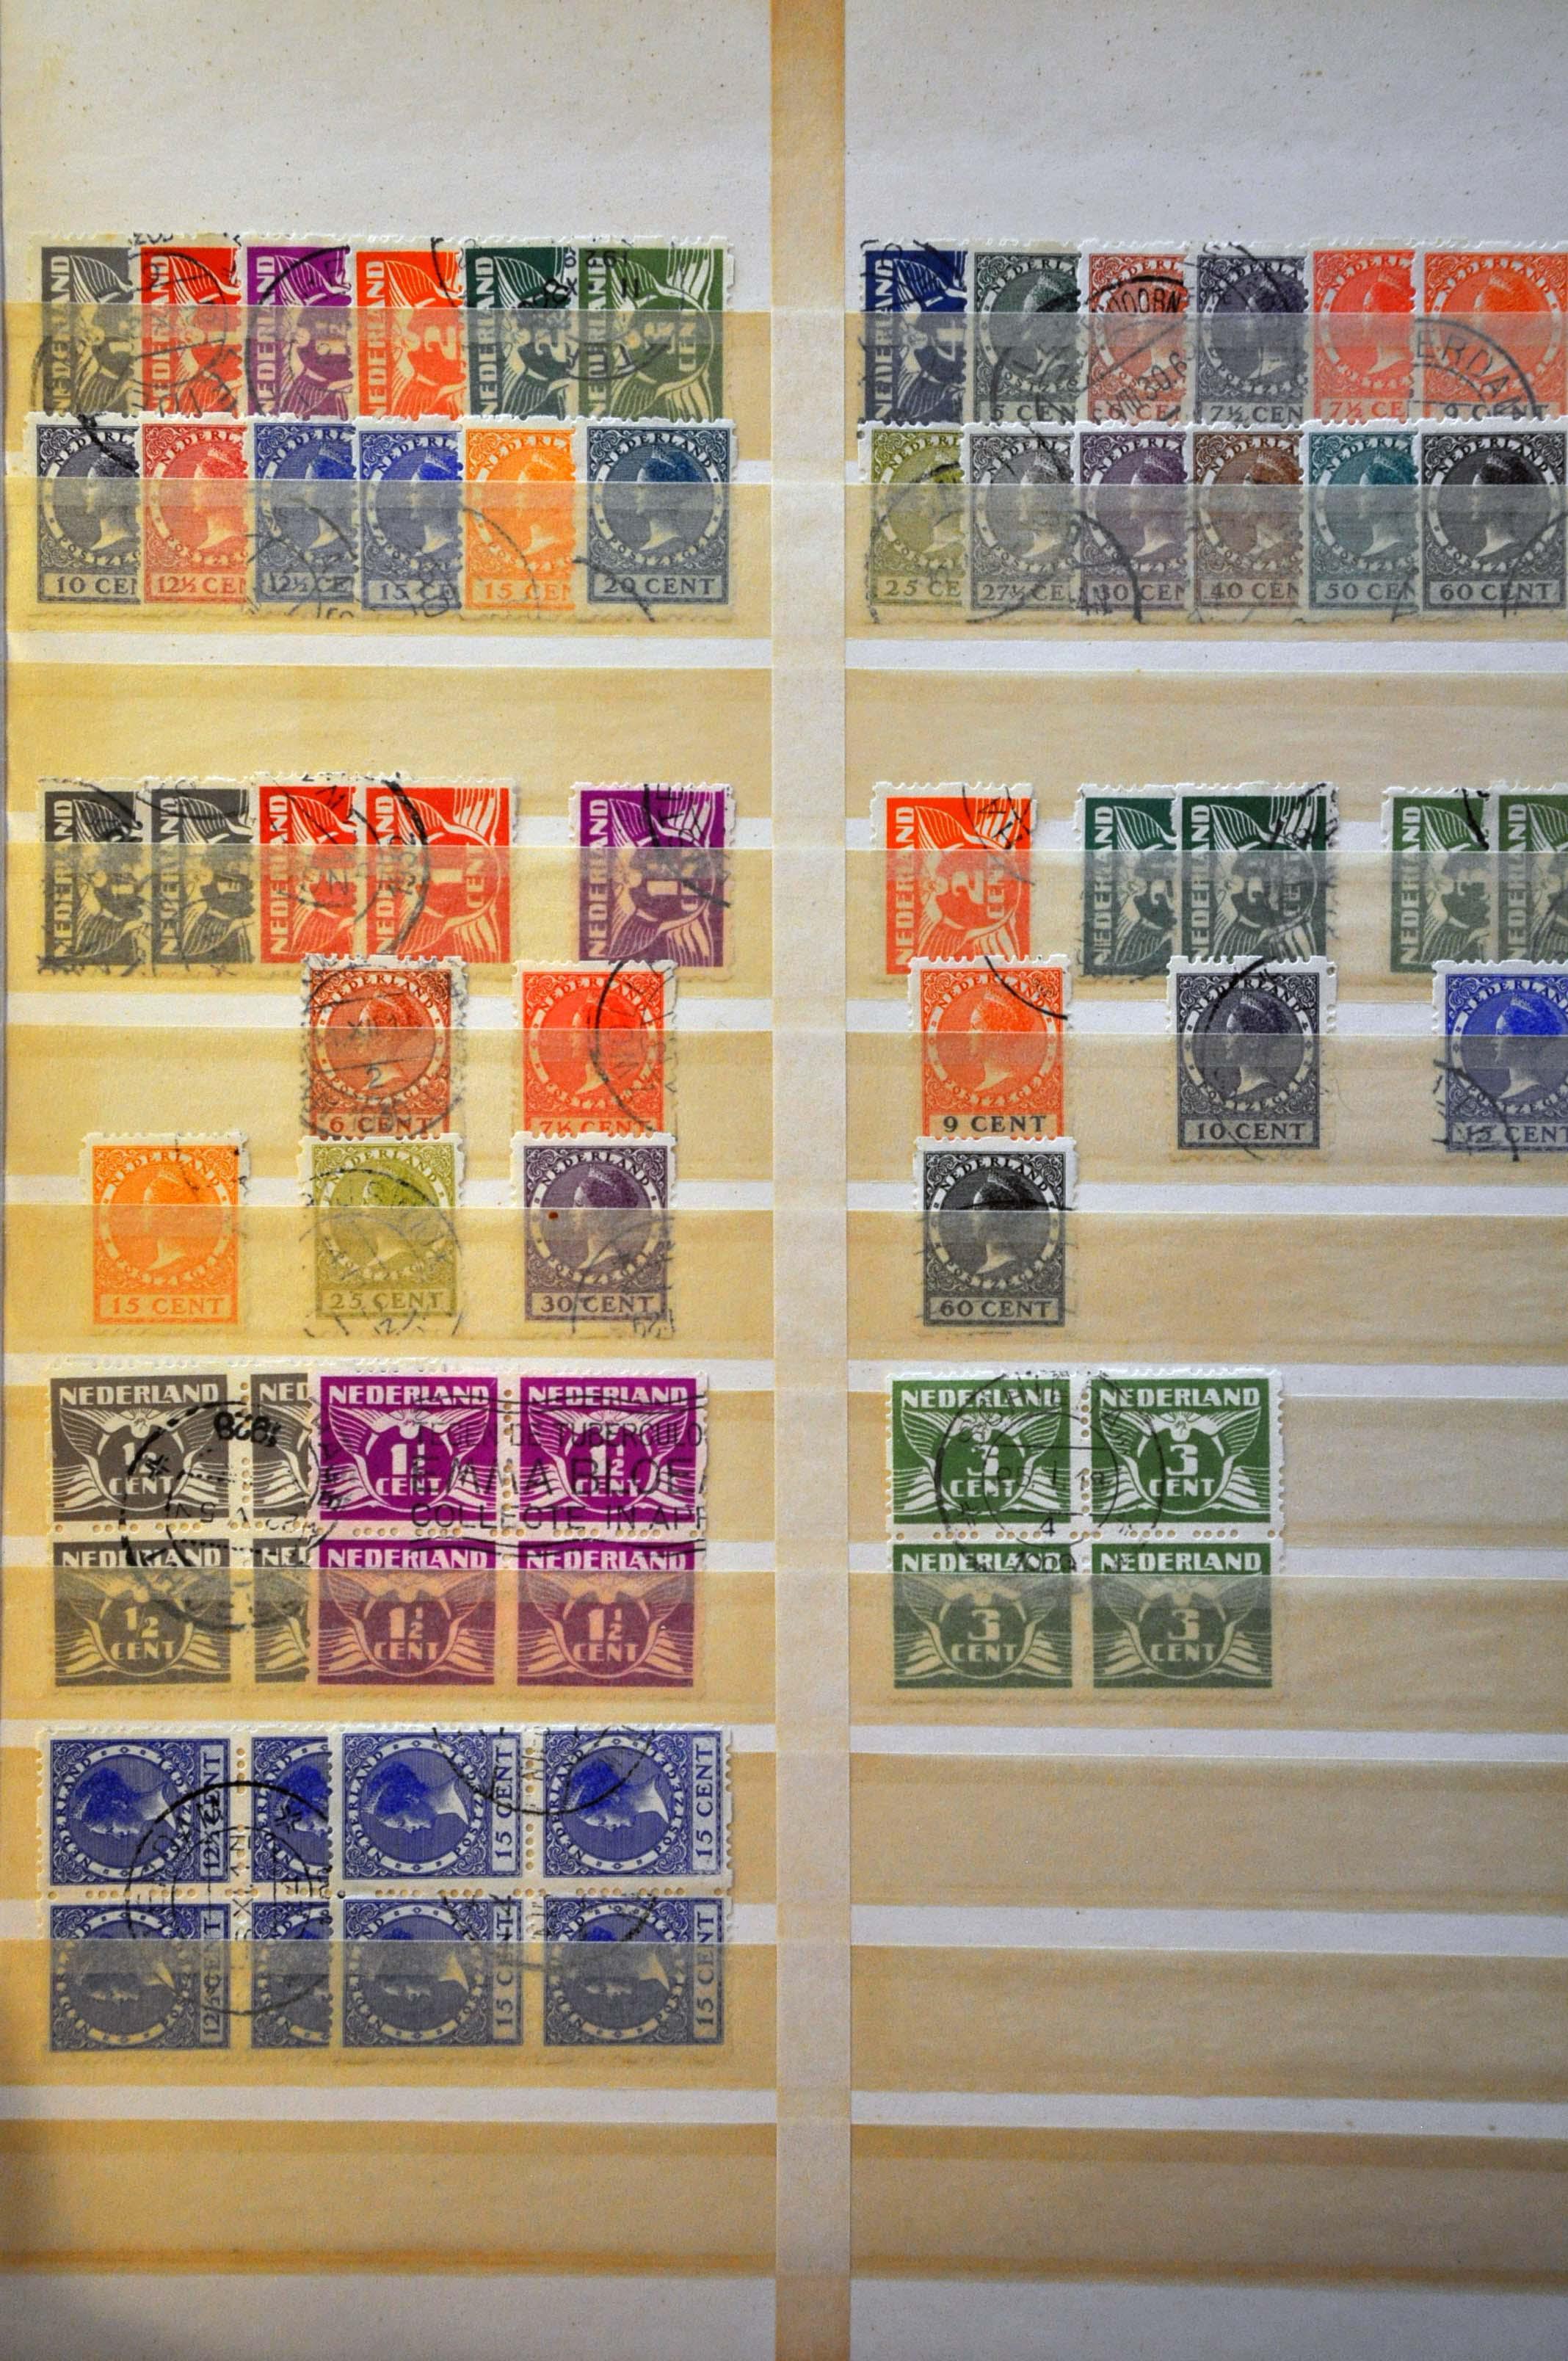 Lot 1504 - Netherlands and former colonies Netherlands -  Corinphila Veilingen Auction 239: General sale